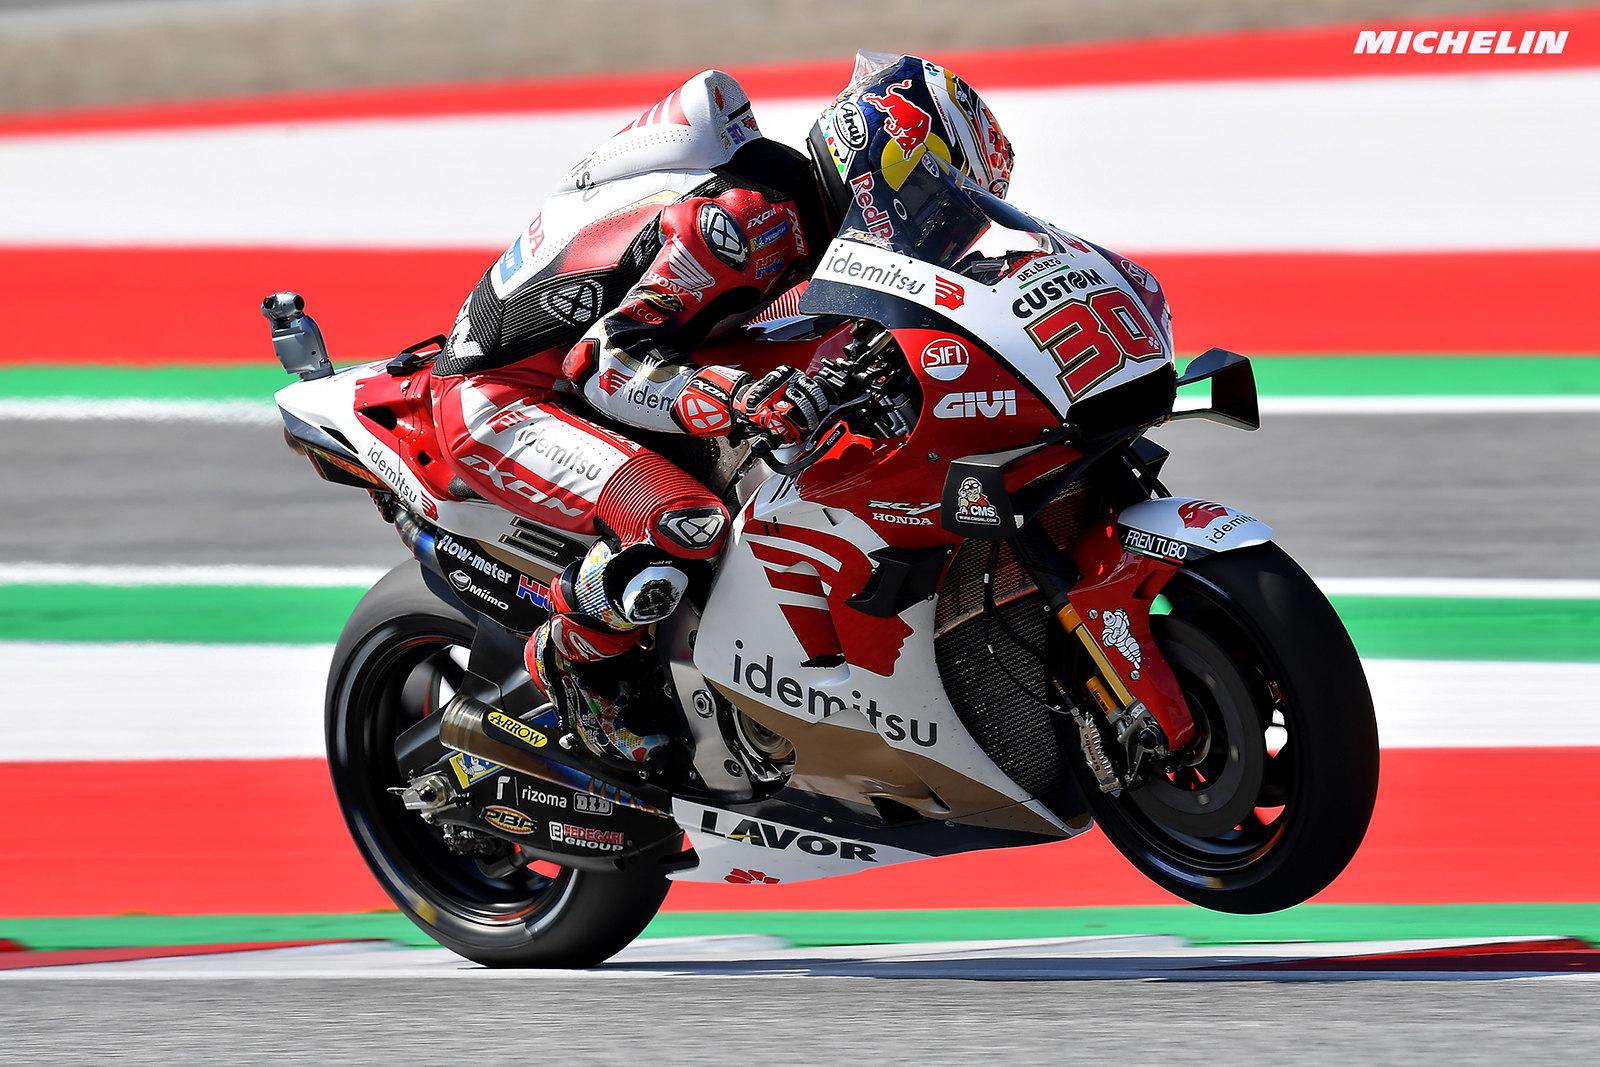 MotoGP2021スティリアGP 予選10位中上 貴晶「10番手は望んだ位置ではない」